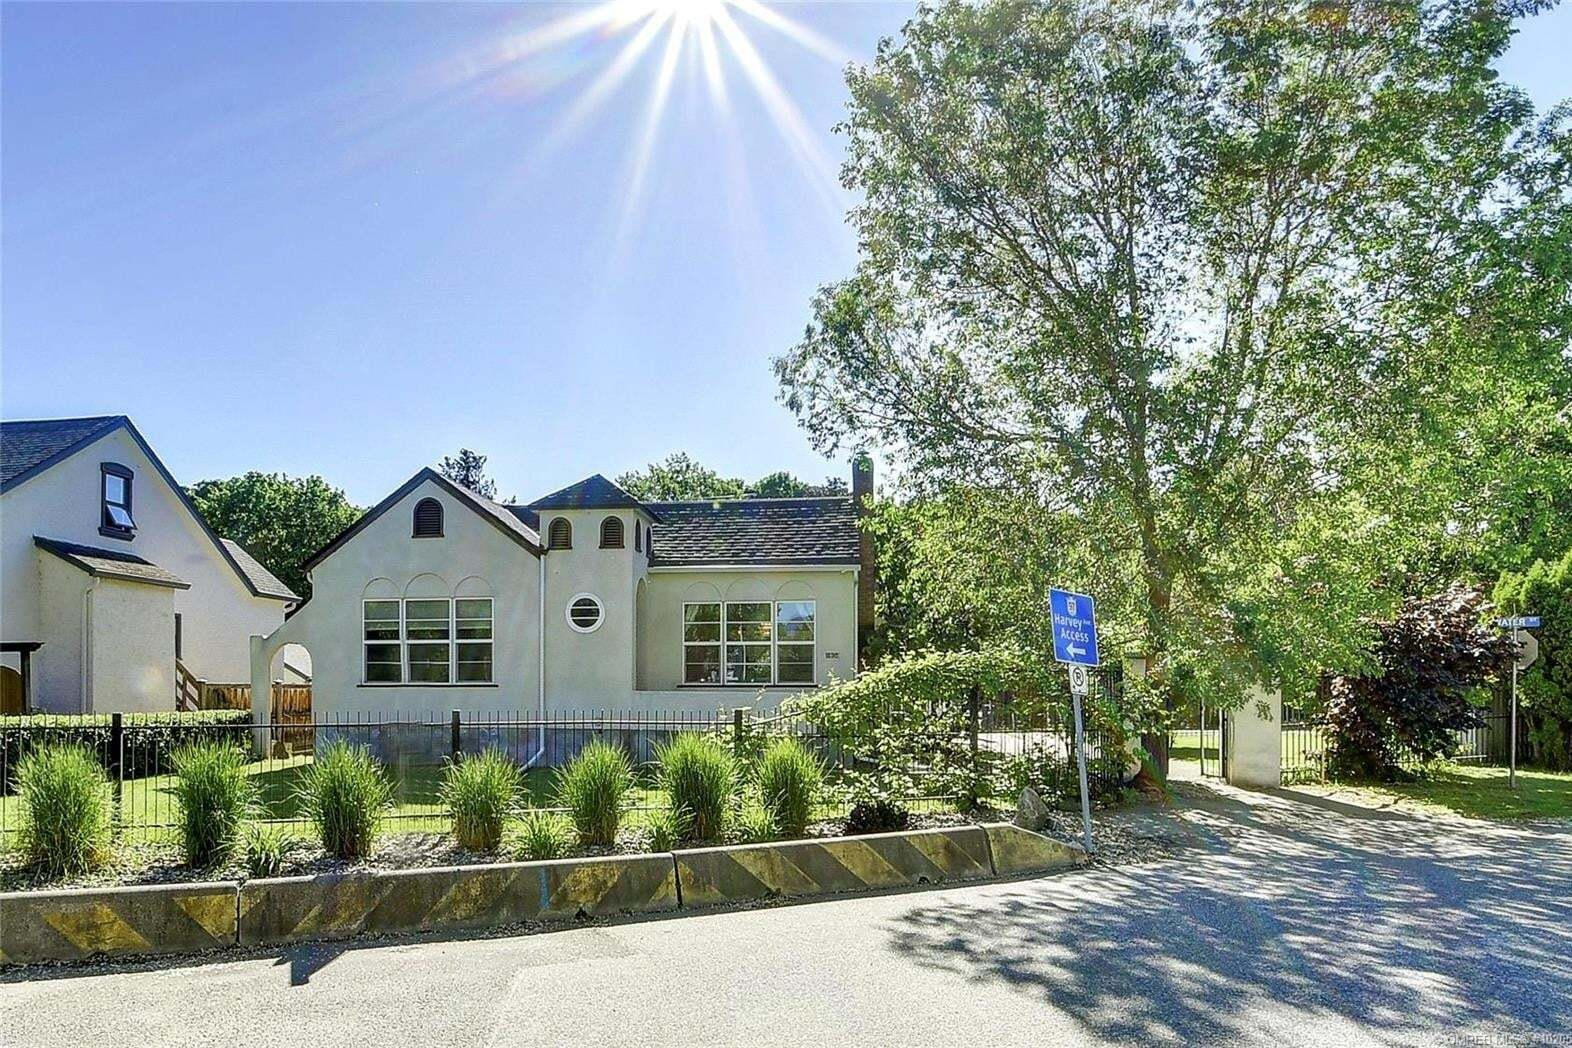 House for sale at 1804 Water St Kelowna British Columbia - MLS: 10205420